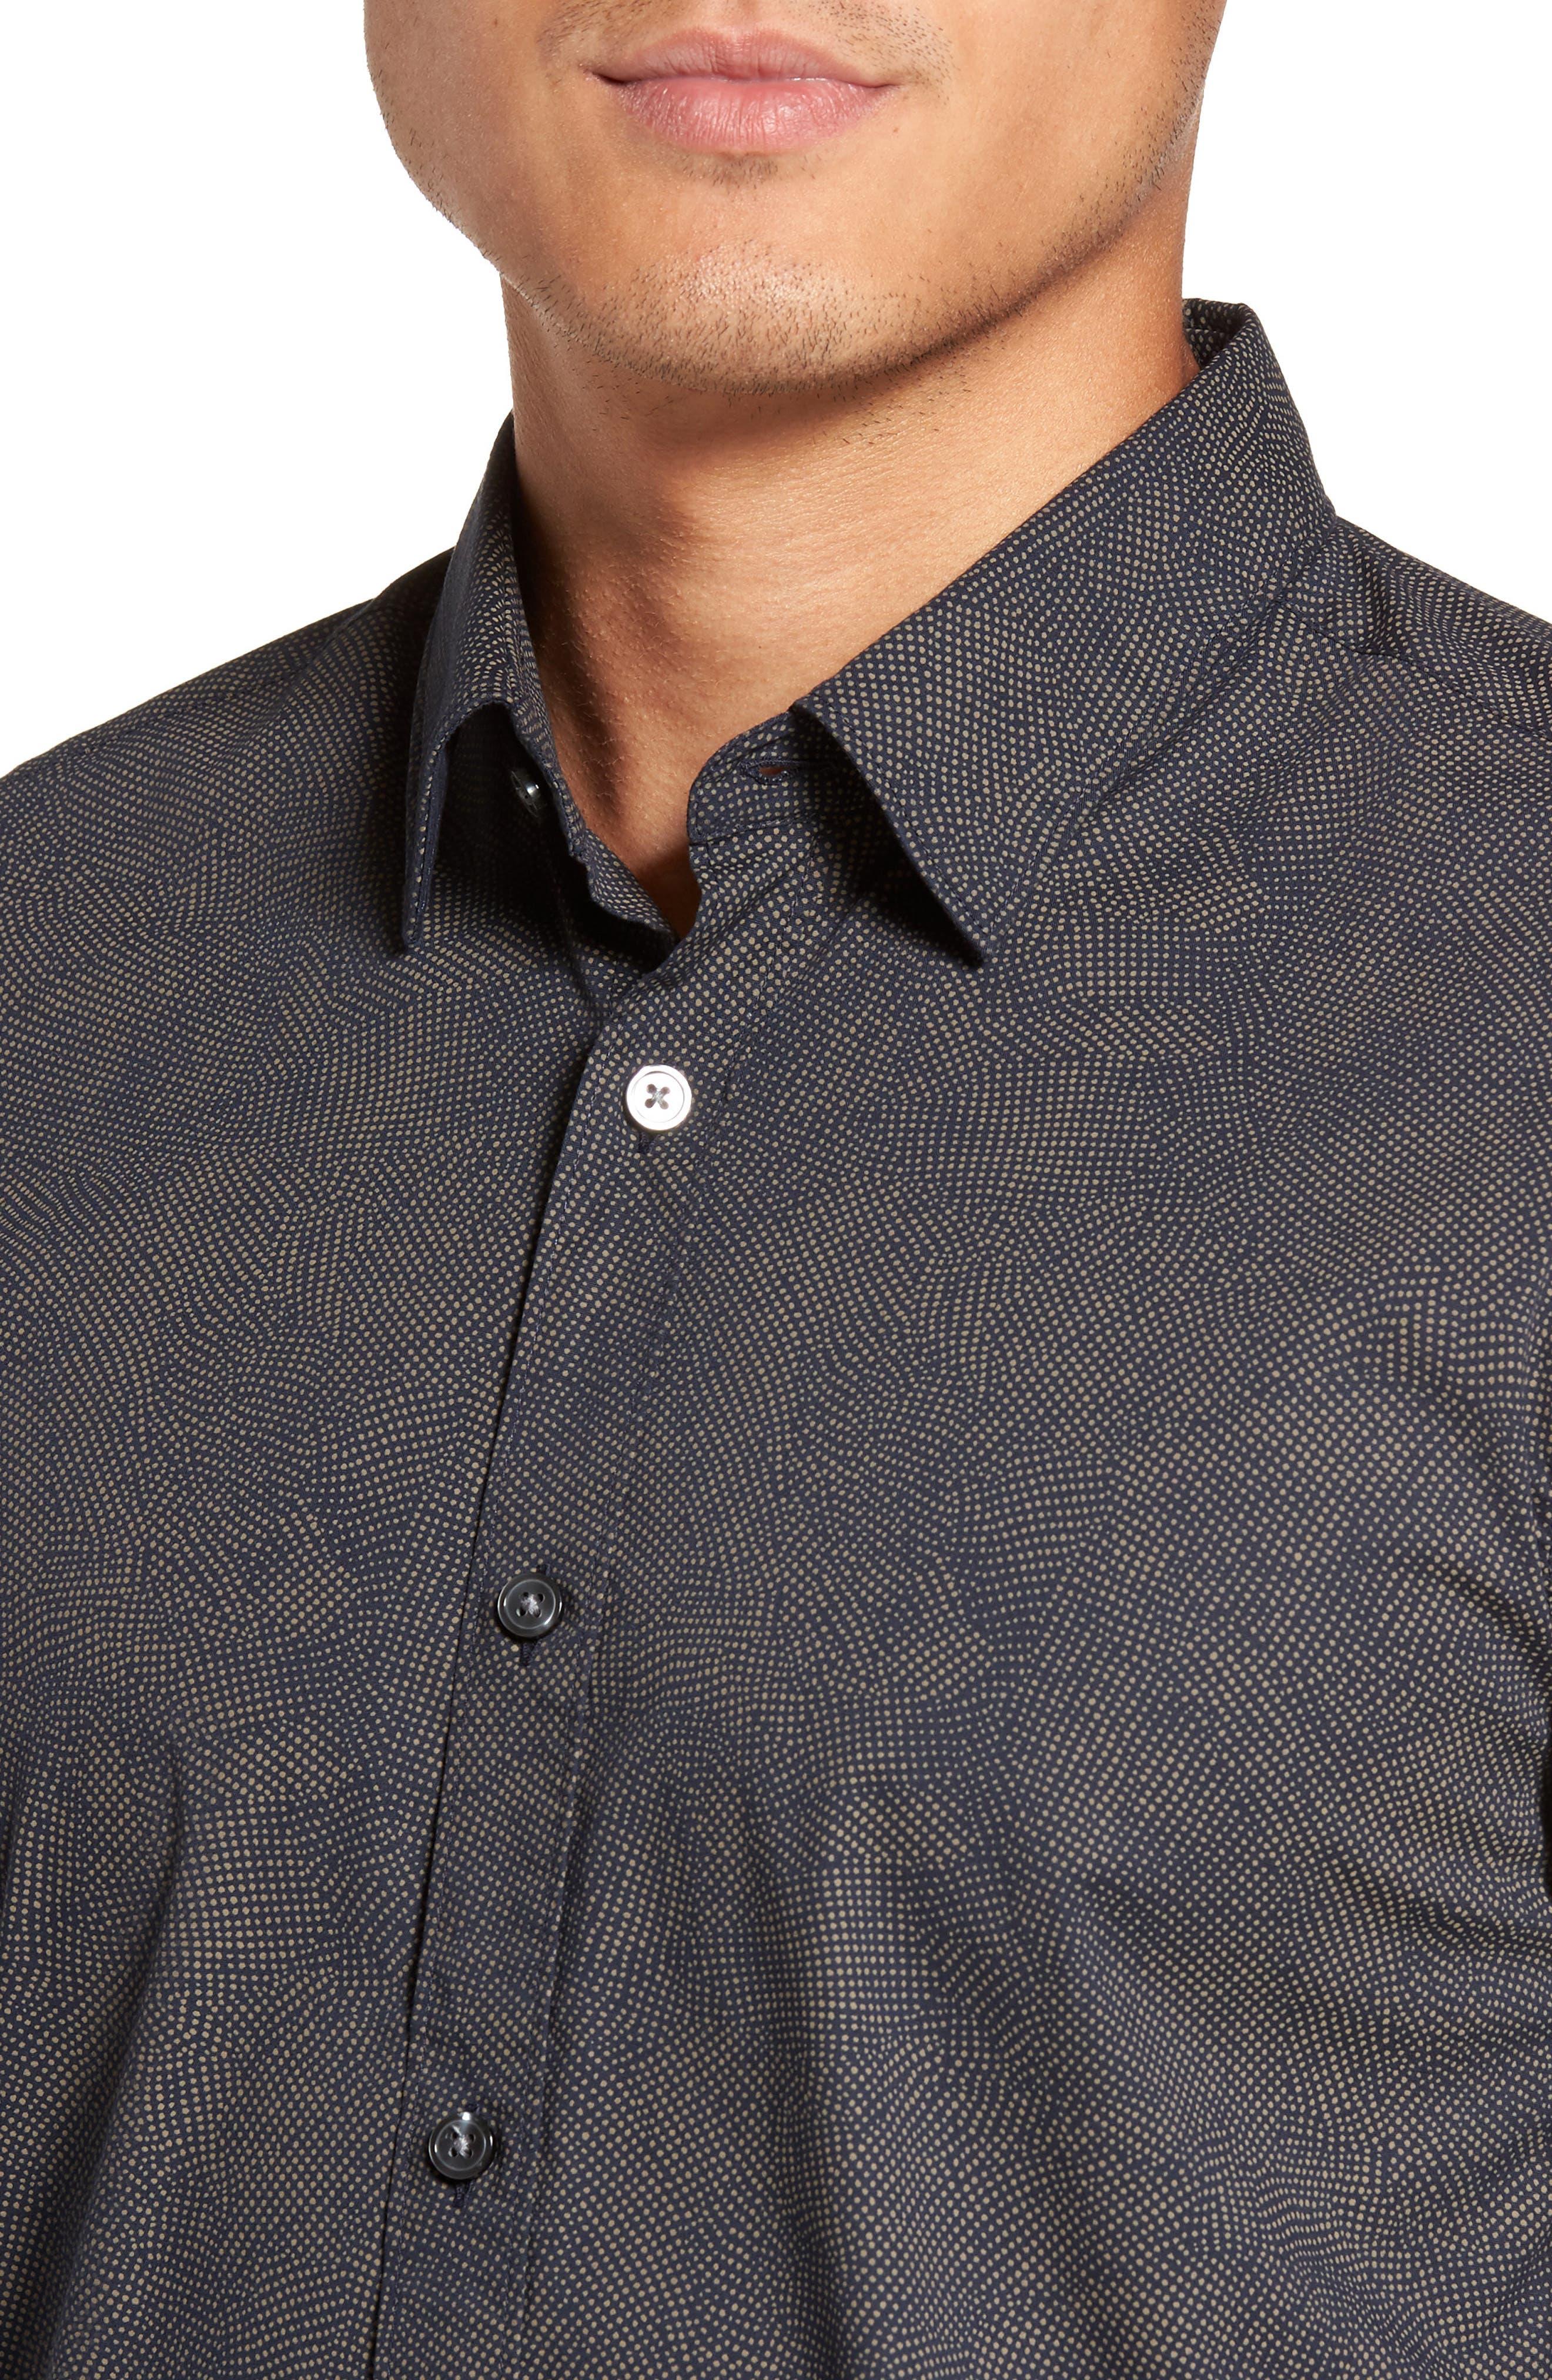 Alternate Image 4  - BOSS Hugo Boss Ronni Print Trim Fit Sport Shirt